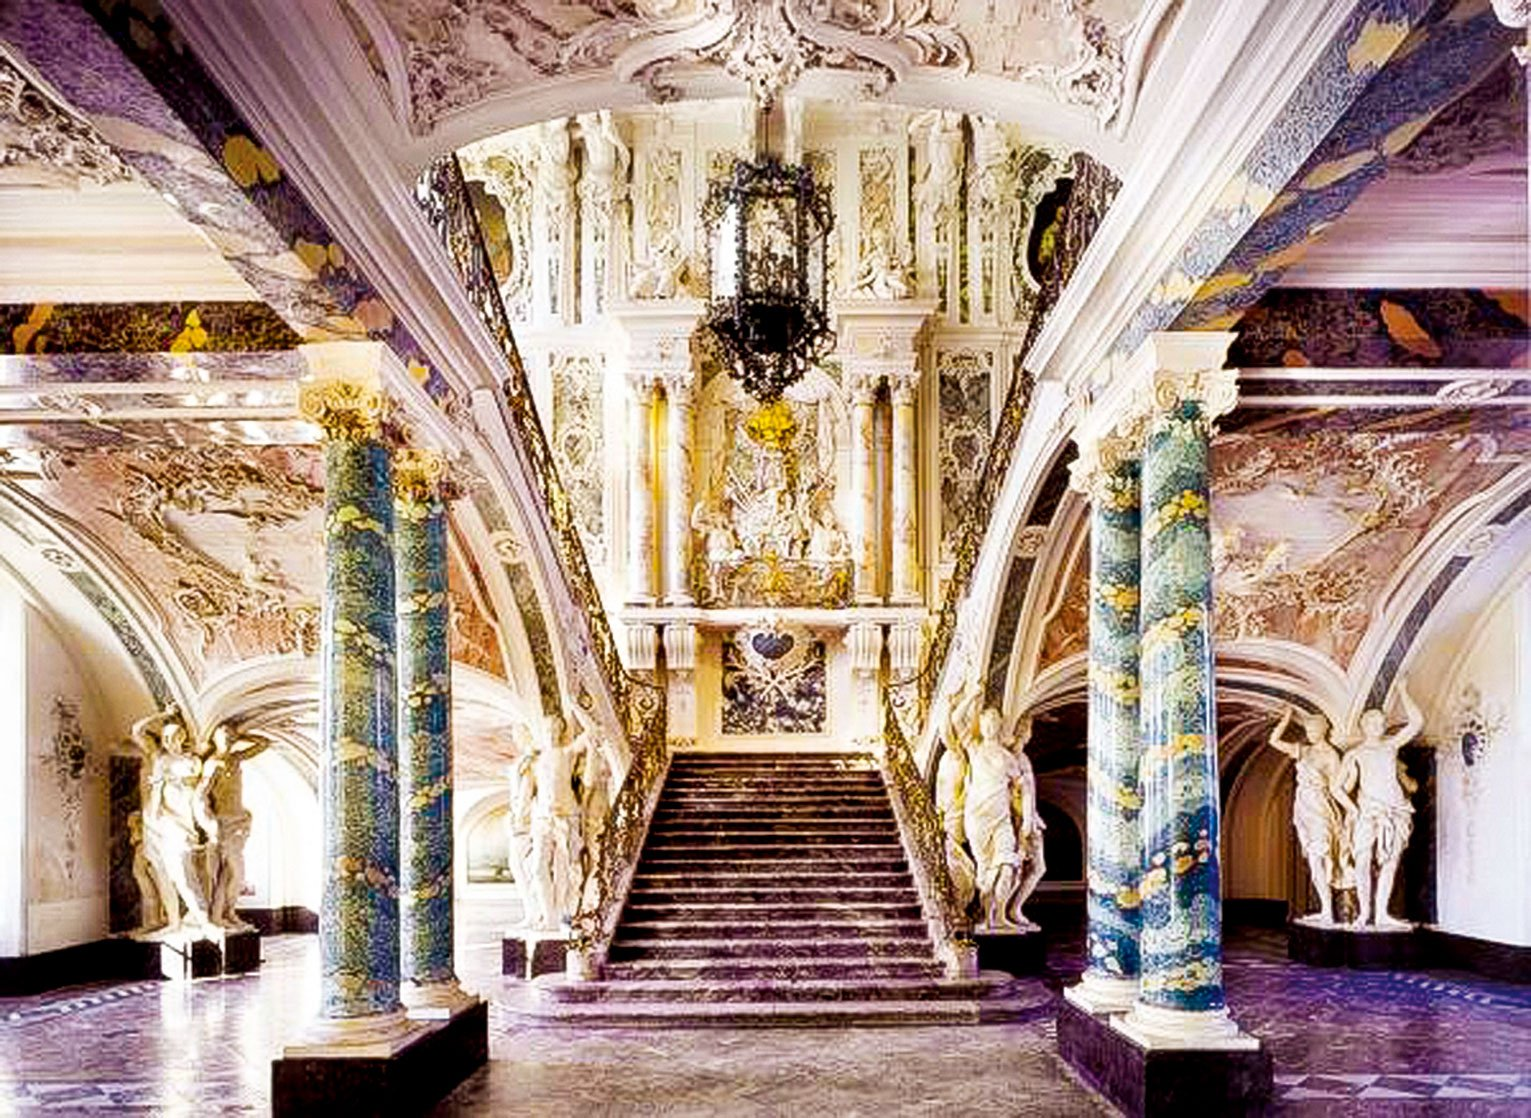 由巴爾塔薩·諾伊曼(Balthasar Neumann)設計的主階梯。(Horst Gummersbach 提供/UNESCO World Heritage Site Palaces Augustusburg and Falkenlust, Brühl)